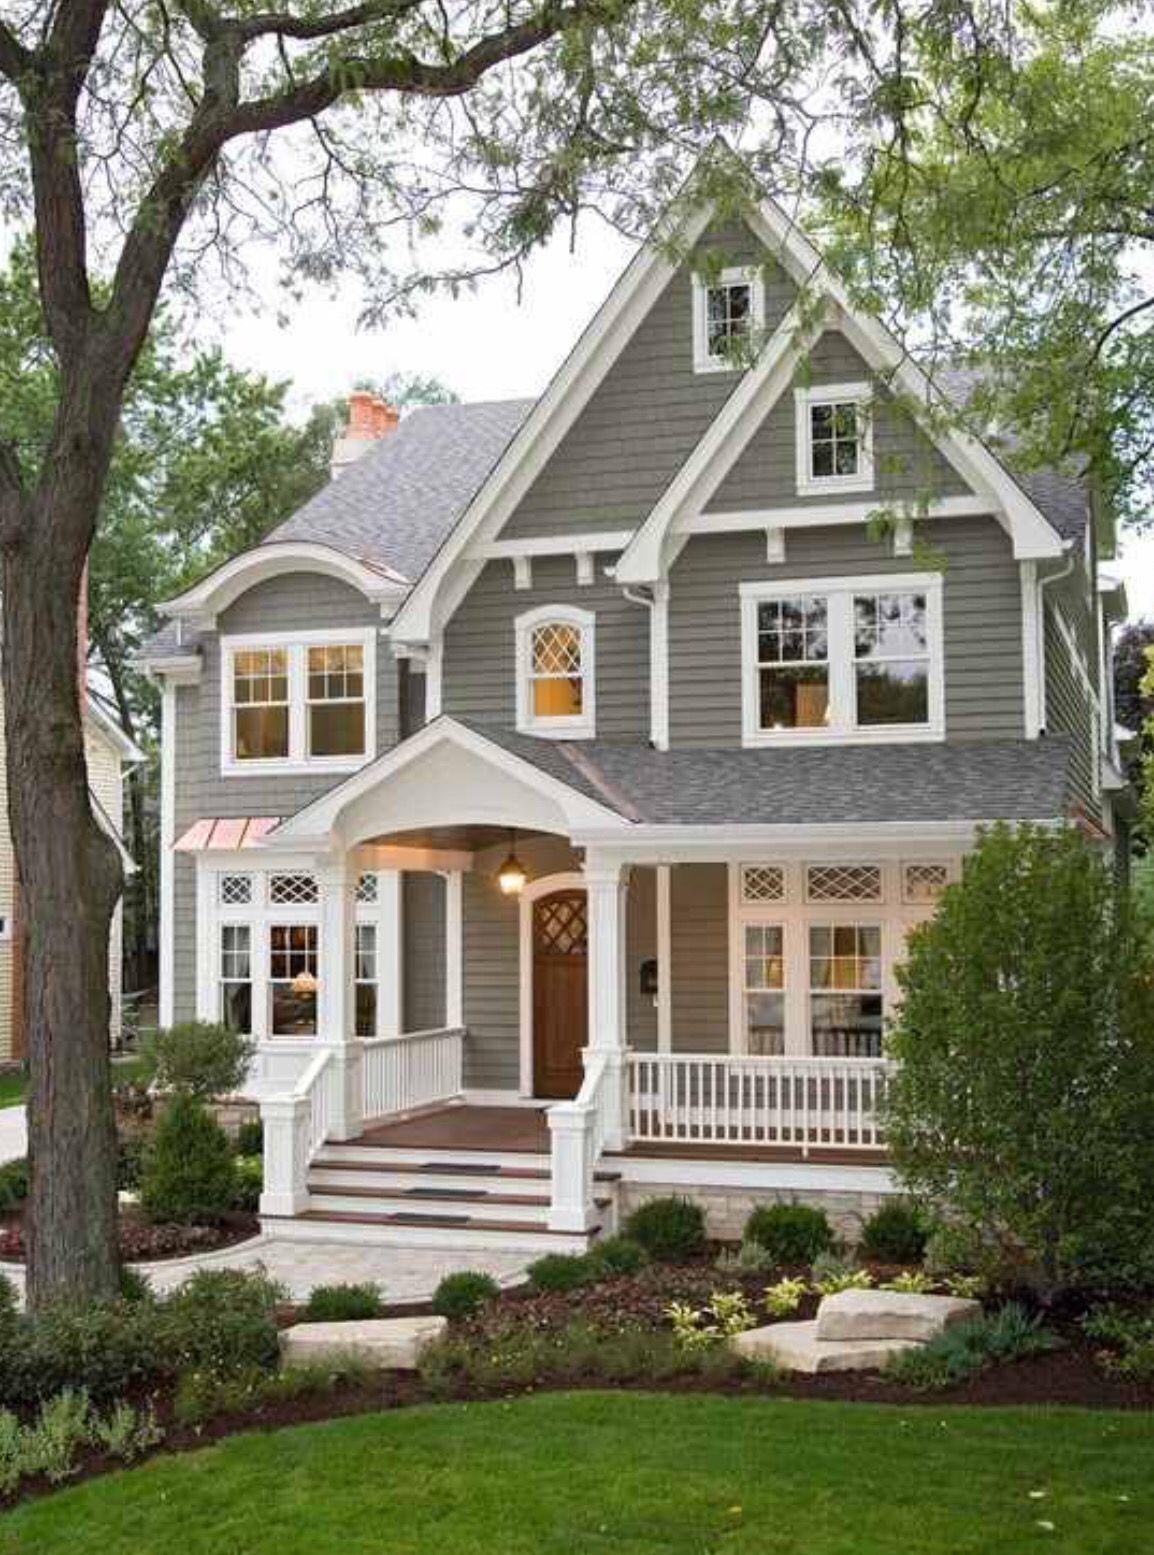 Exterior window trim design ideas  pin by morgan hornung on home design  pinterest  storage ideas